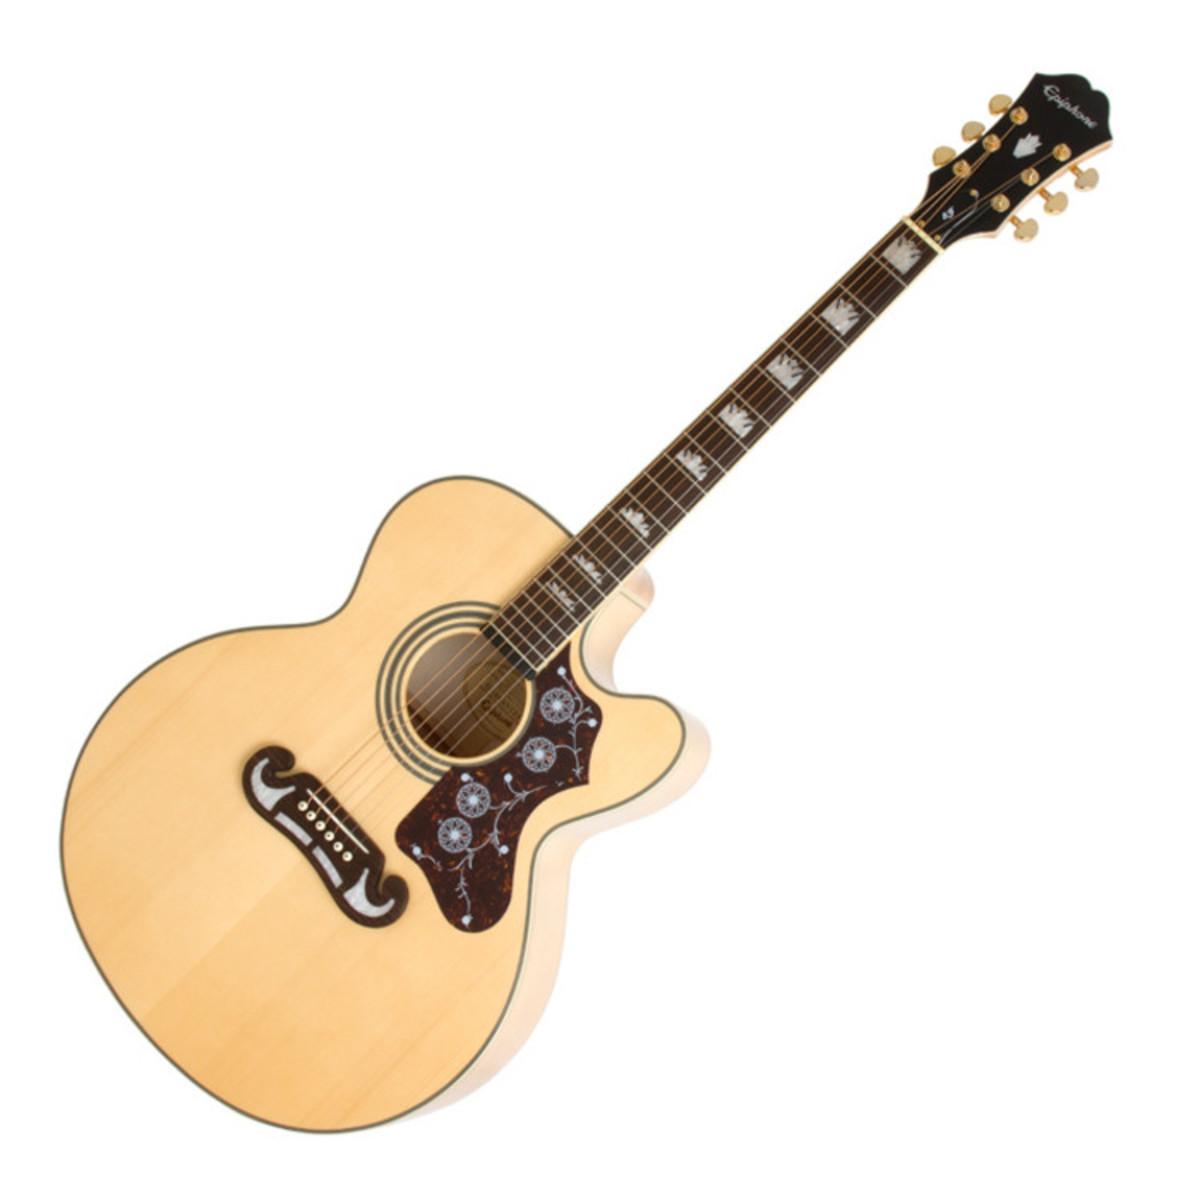 epiphone guitare lectro acoustique ej 200ce natural. Black Bedroom Furniture Sets. Home Design Ideas